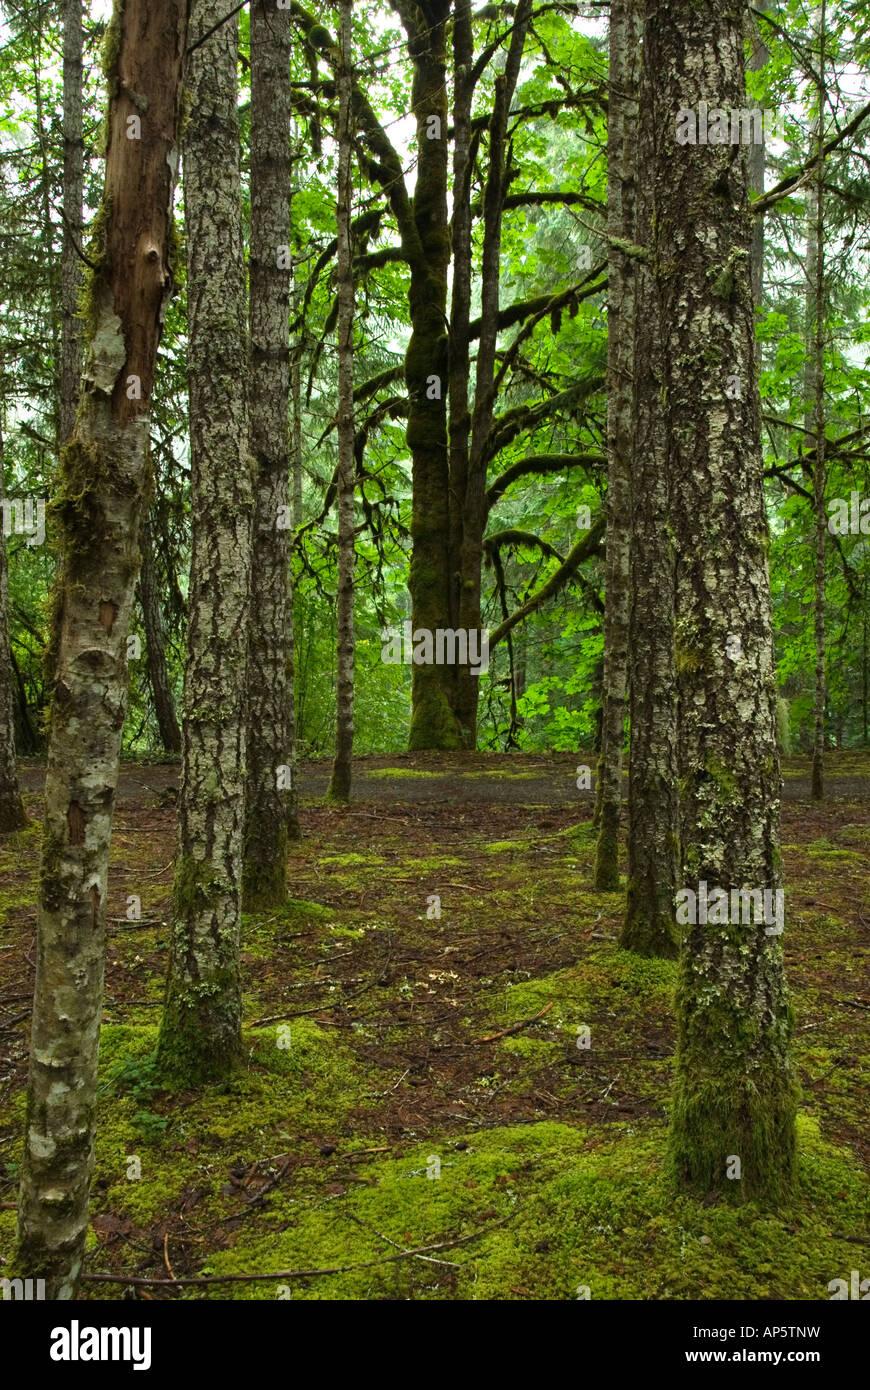 Trees at Englishman River Falls Provincial Park, Vancouver Island, British Columbia, Canada - Stock Image